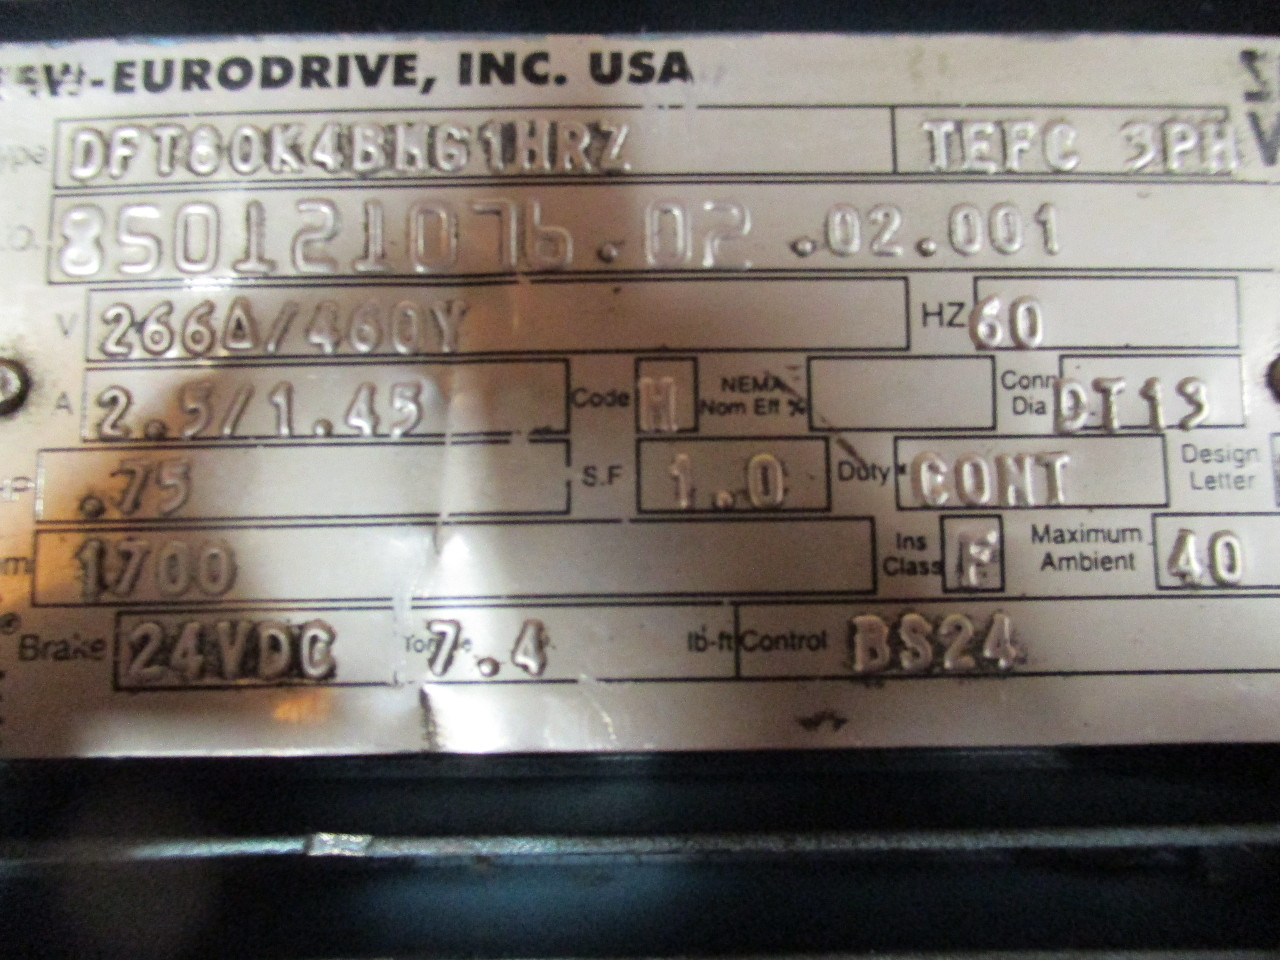 Sew Eurodrive Wiring Diagram Ingersoll 1 Rand Diagrams